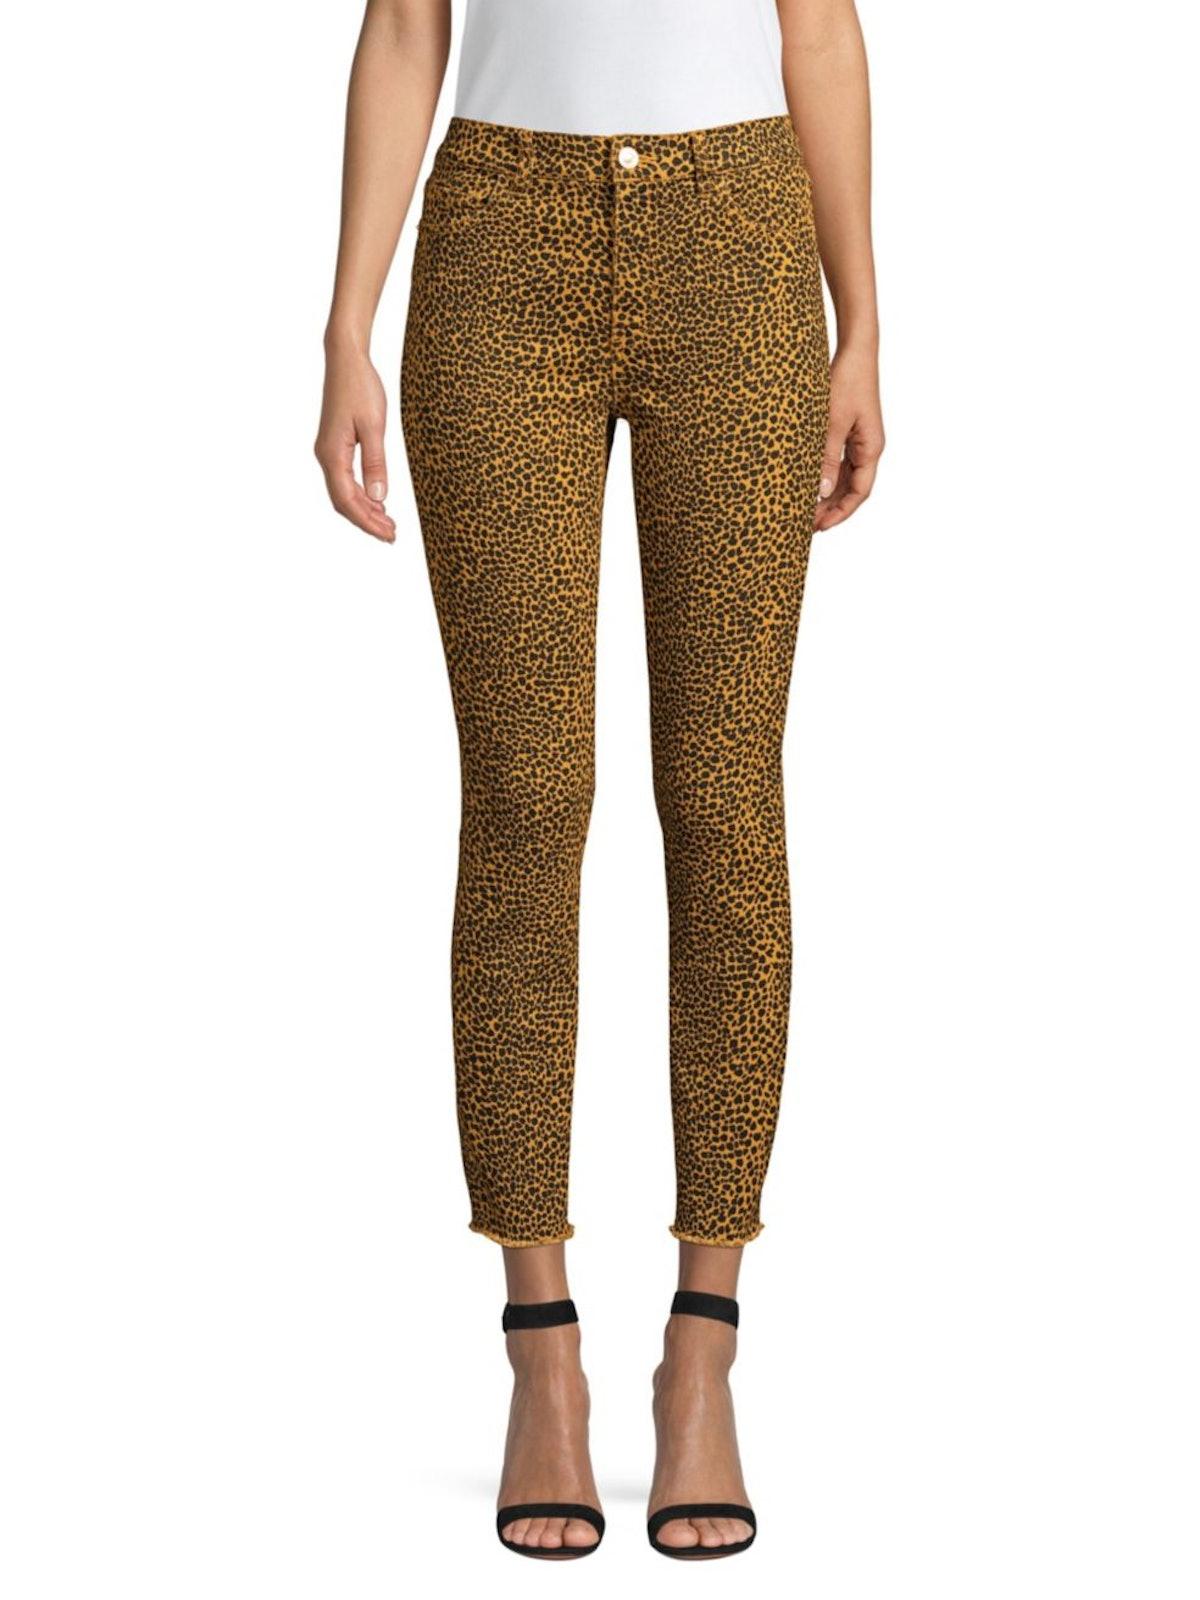 Current/Elliott The High-Waist Stile Leopard Jeans